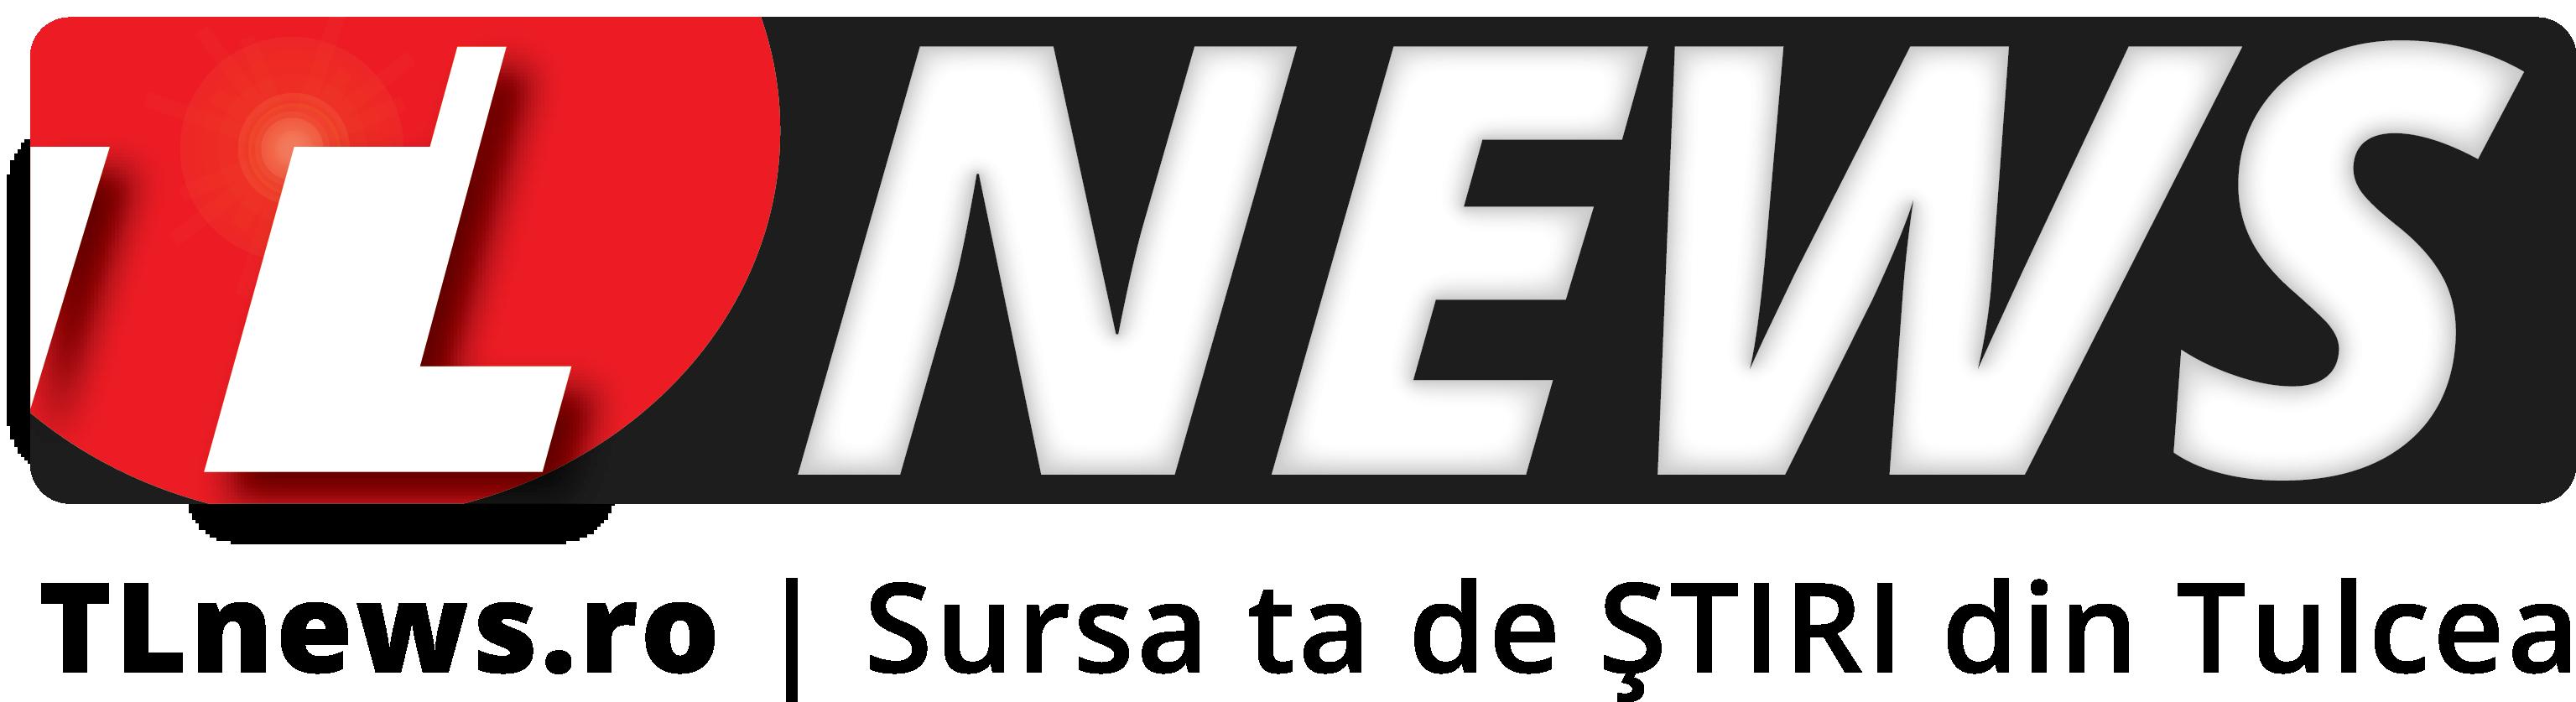 Tulcea News logo